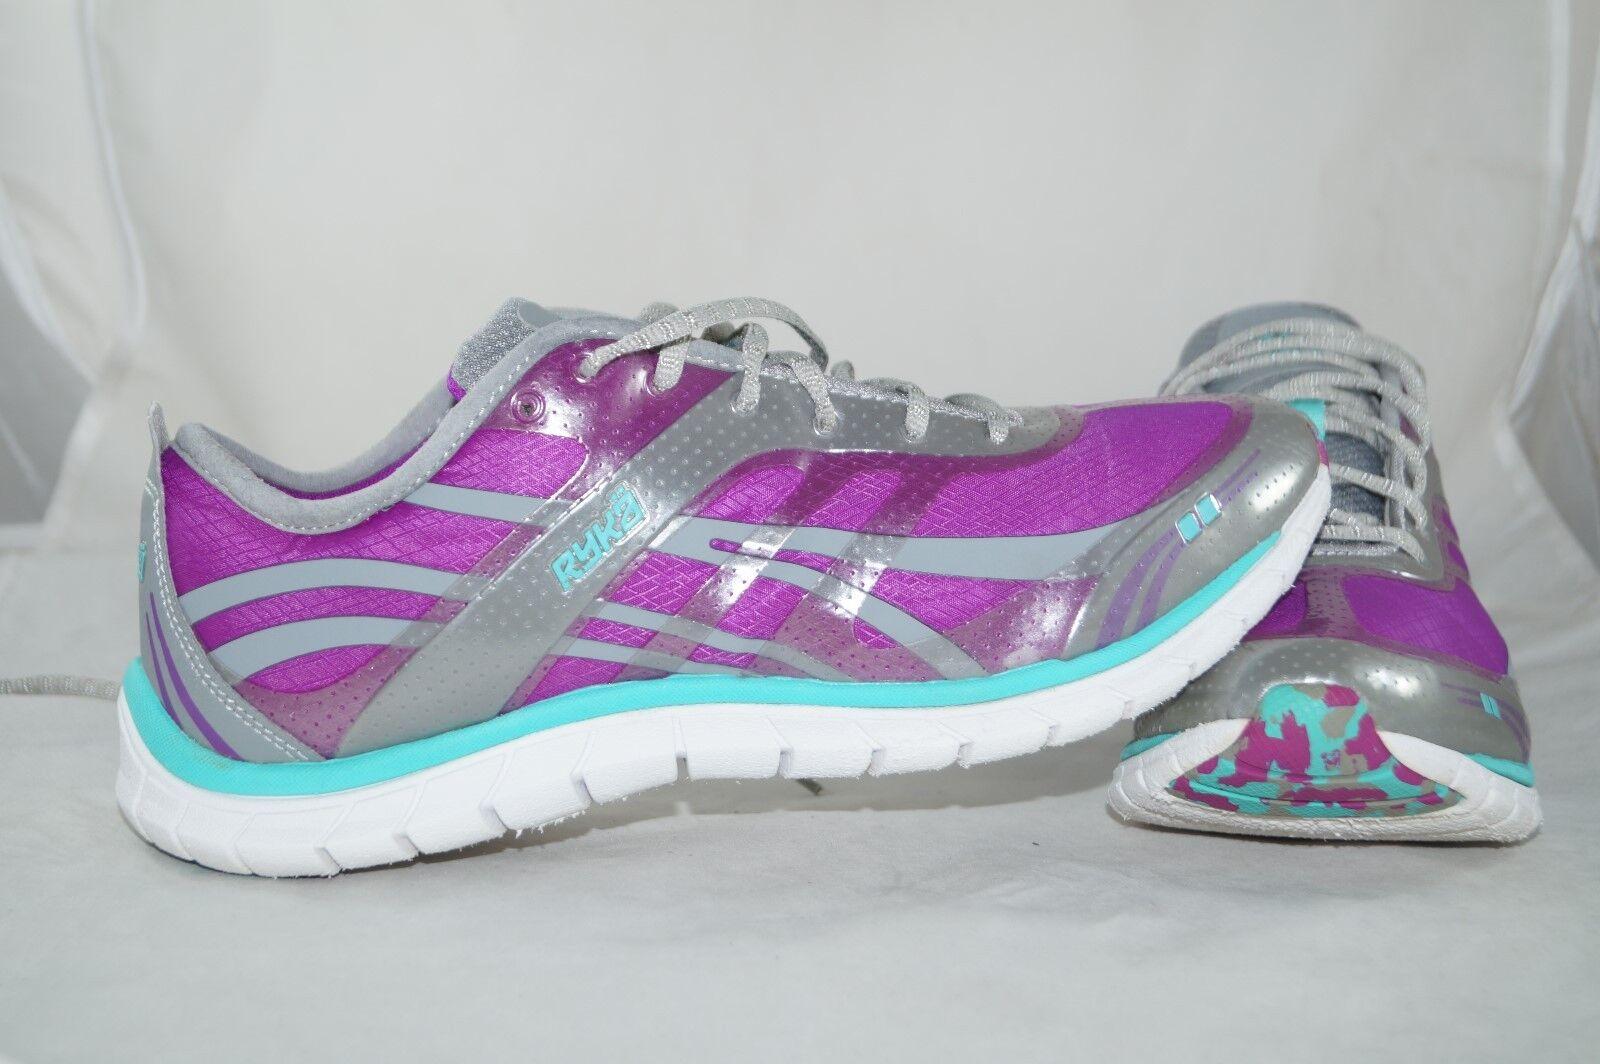 detailing 74faf 12e43 Nike Donna Calze Dart Scarpe da Corsa 848475 100 100 100 Scarpe da Tennis  Svendita 141f6d